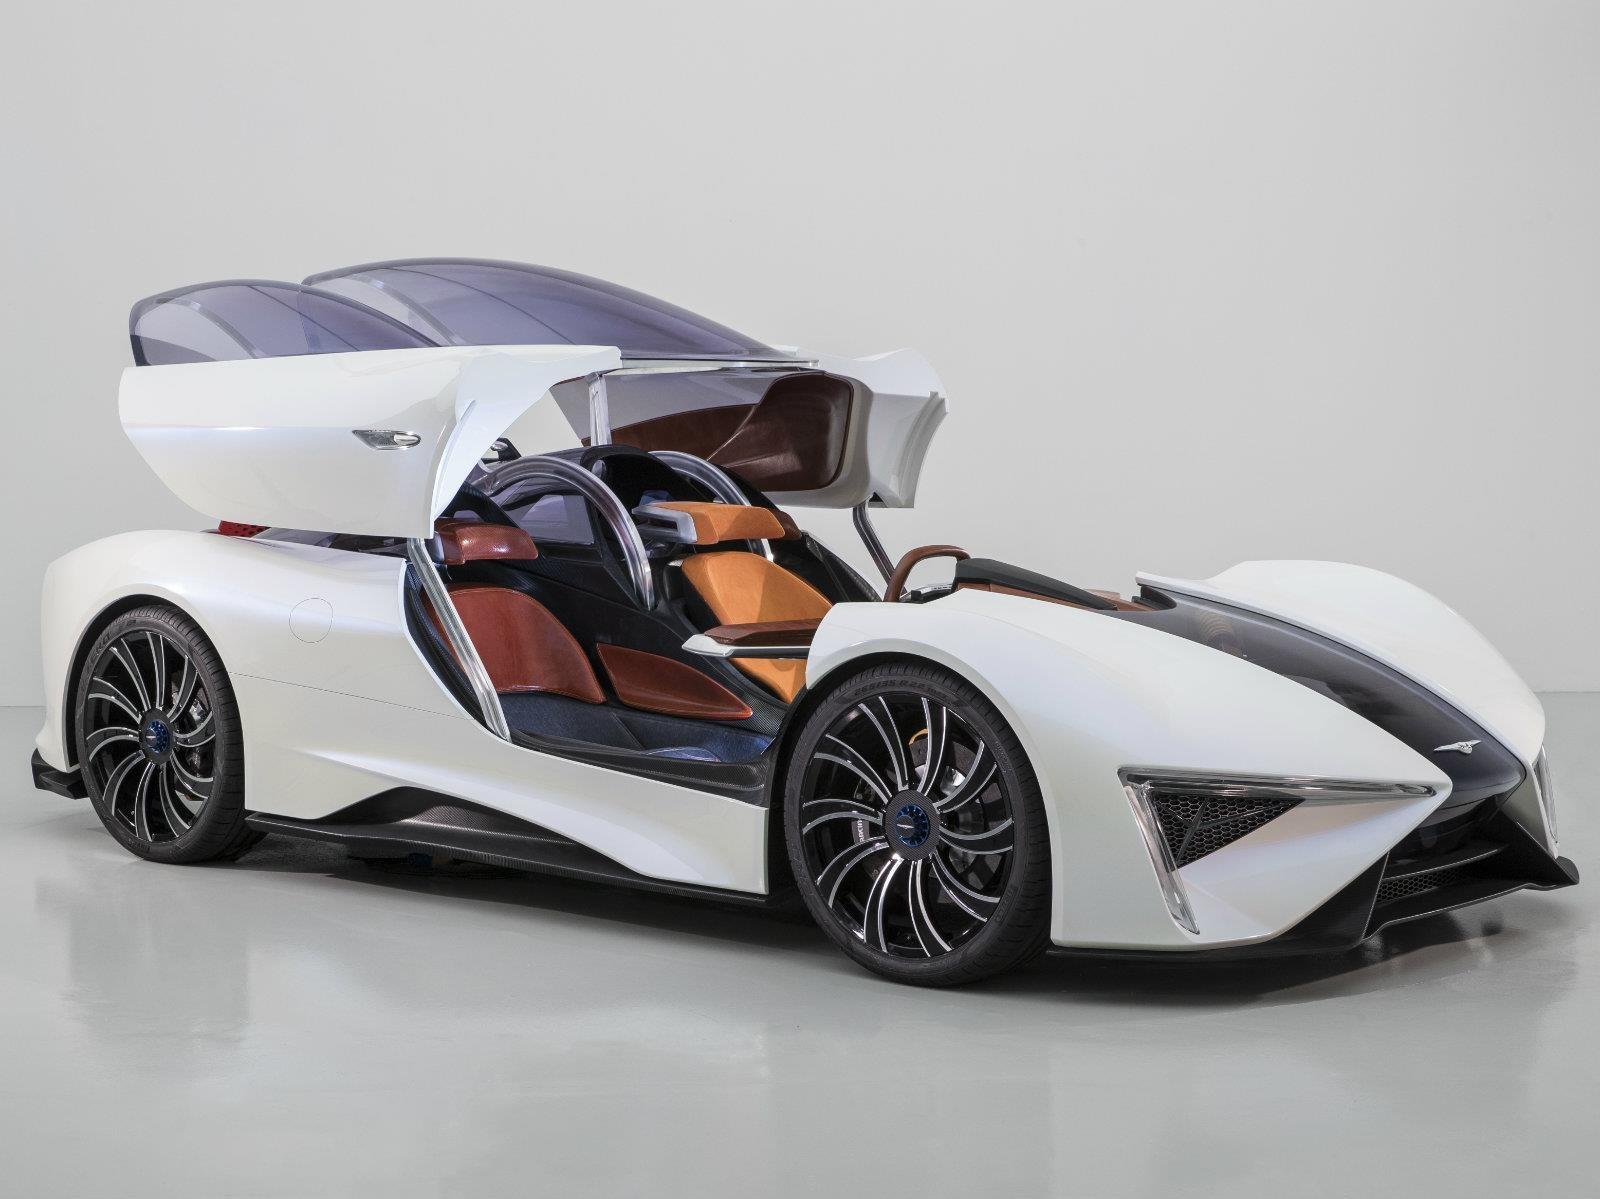 TechRules Ren, un súper auto hecho en China